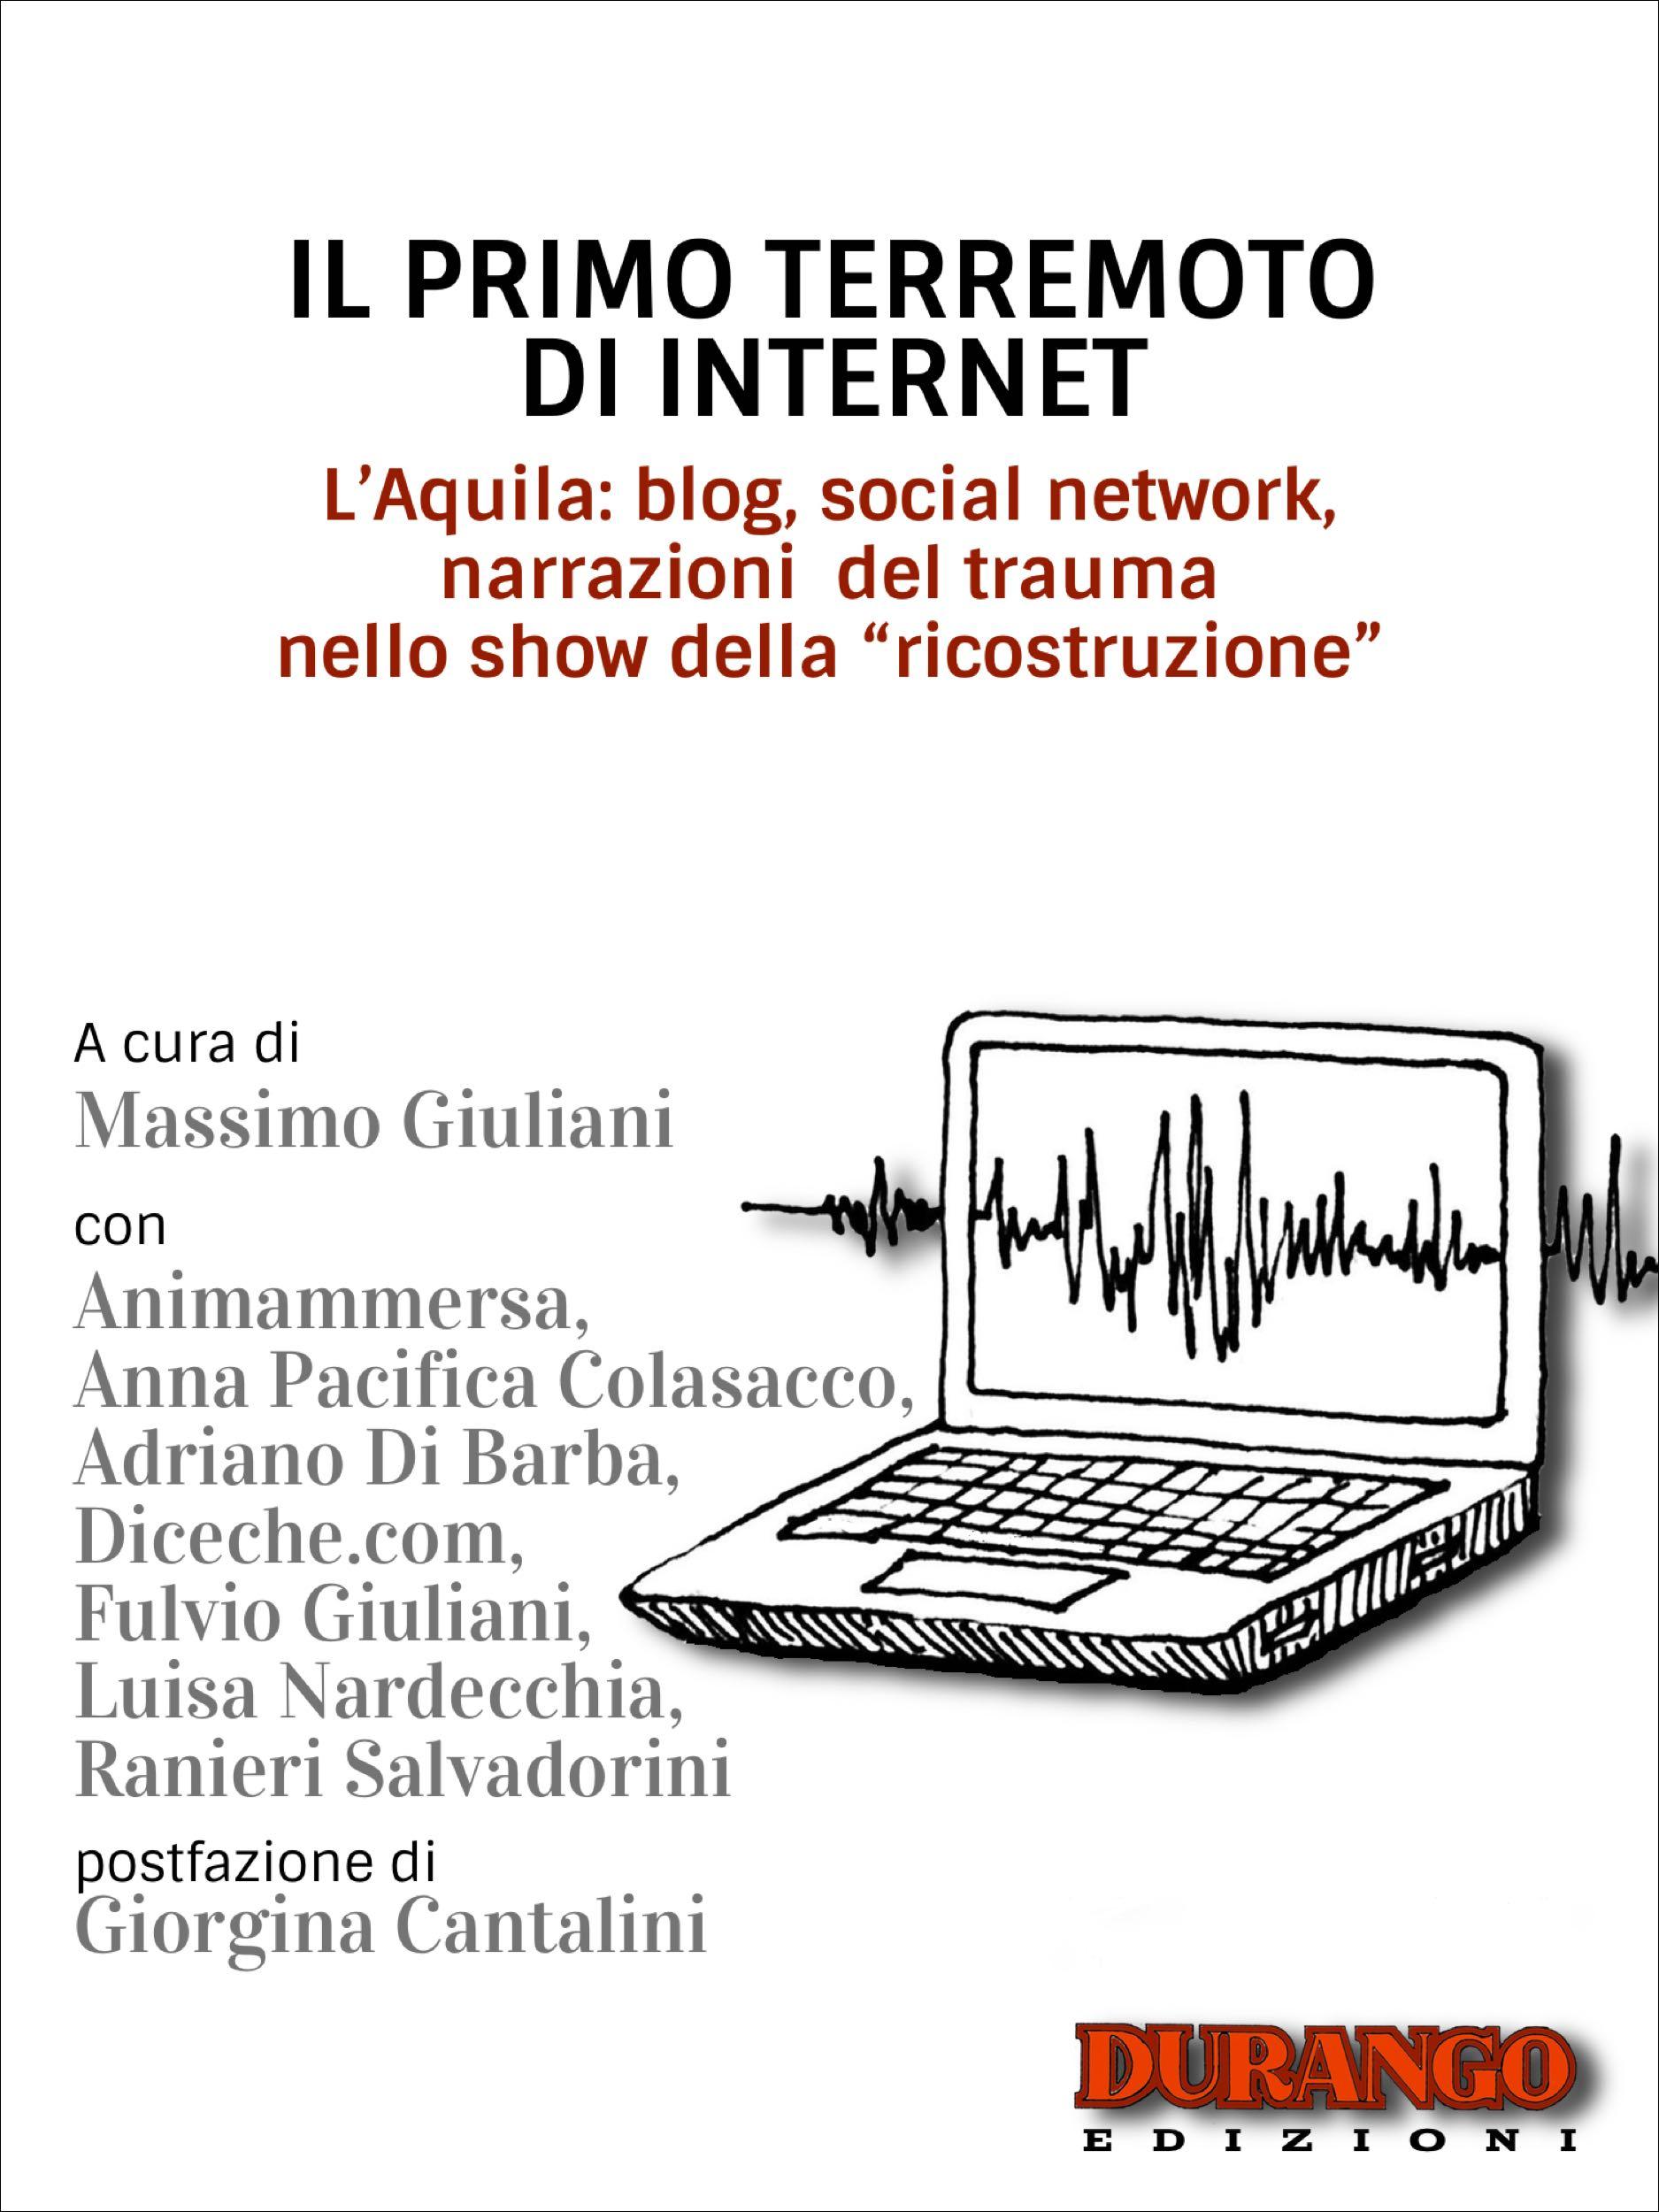 Terremoto e social network